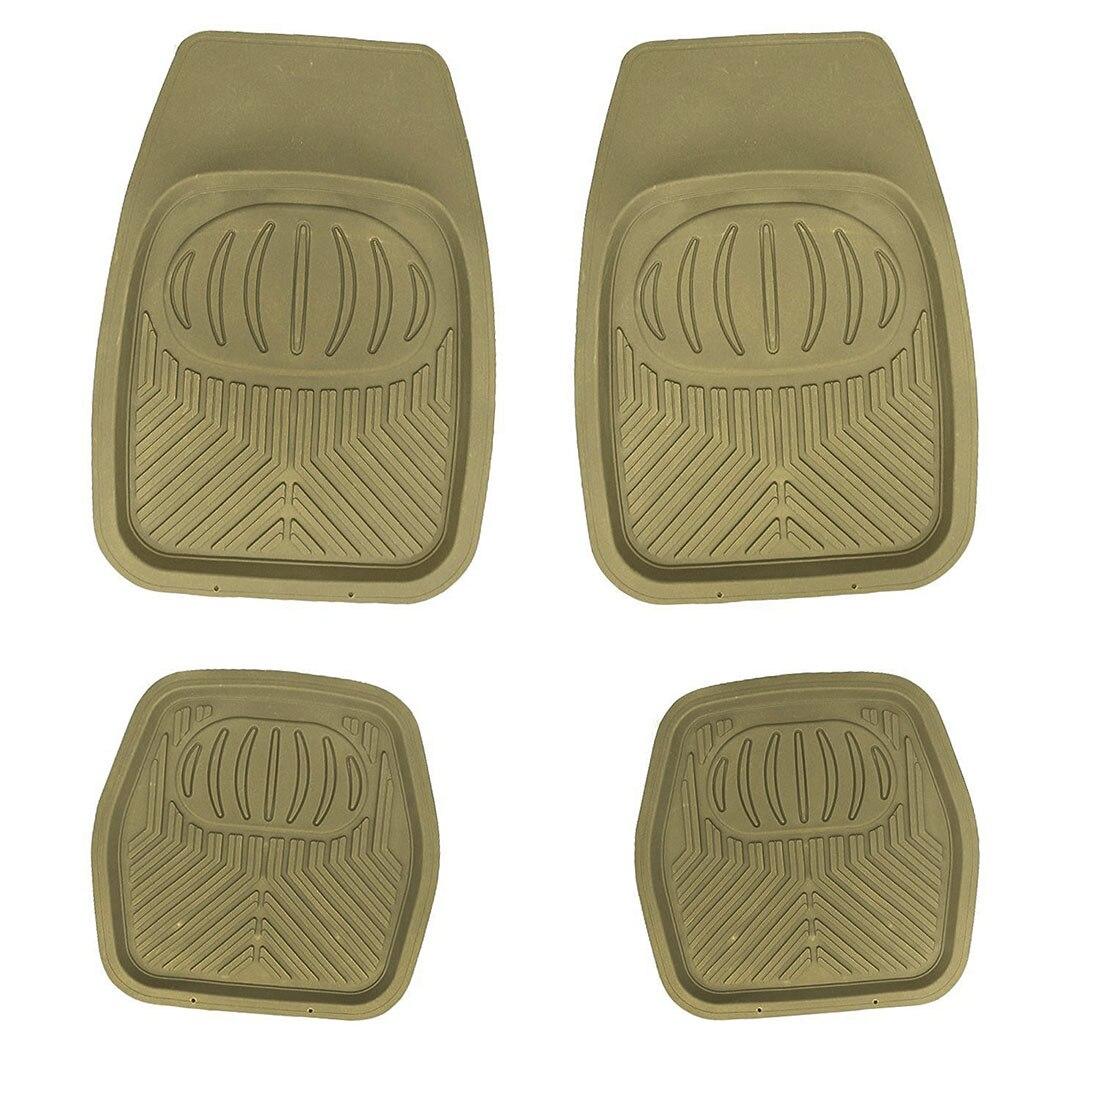 Rubber floor mats vw jetta - Multi Season Rubber Floor Mats 4pc Set Beige Fit Most Cars Suvs Vans And